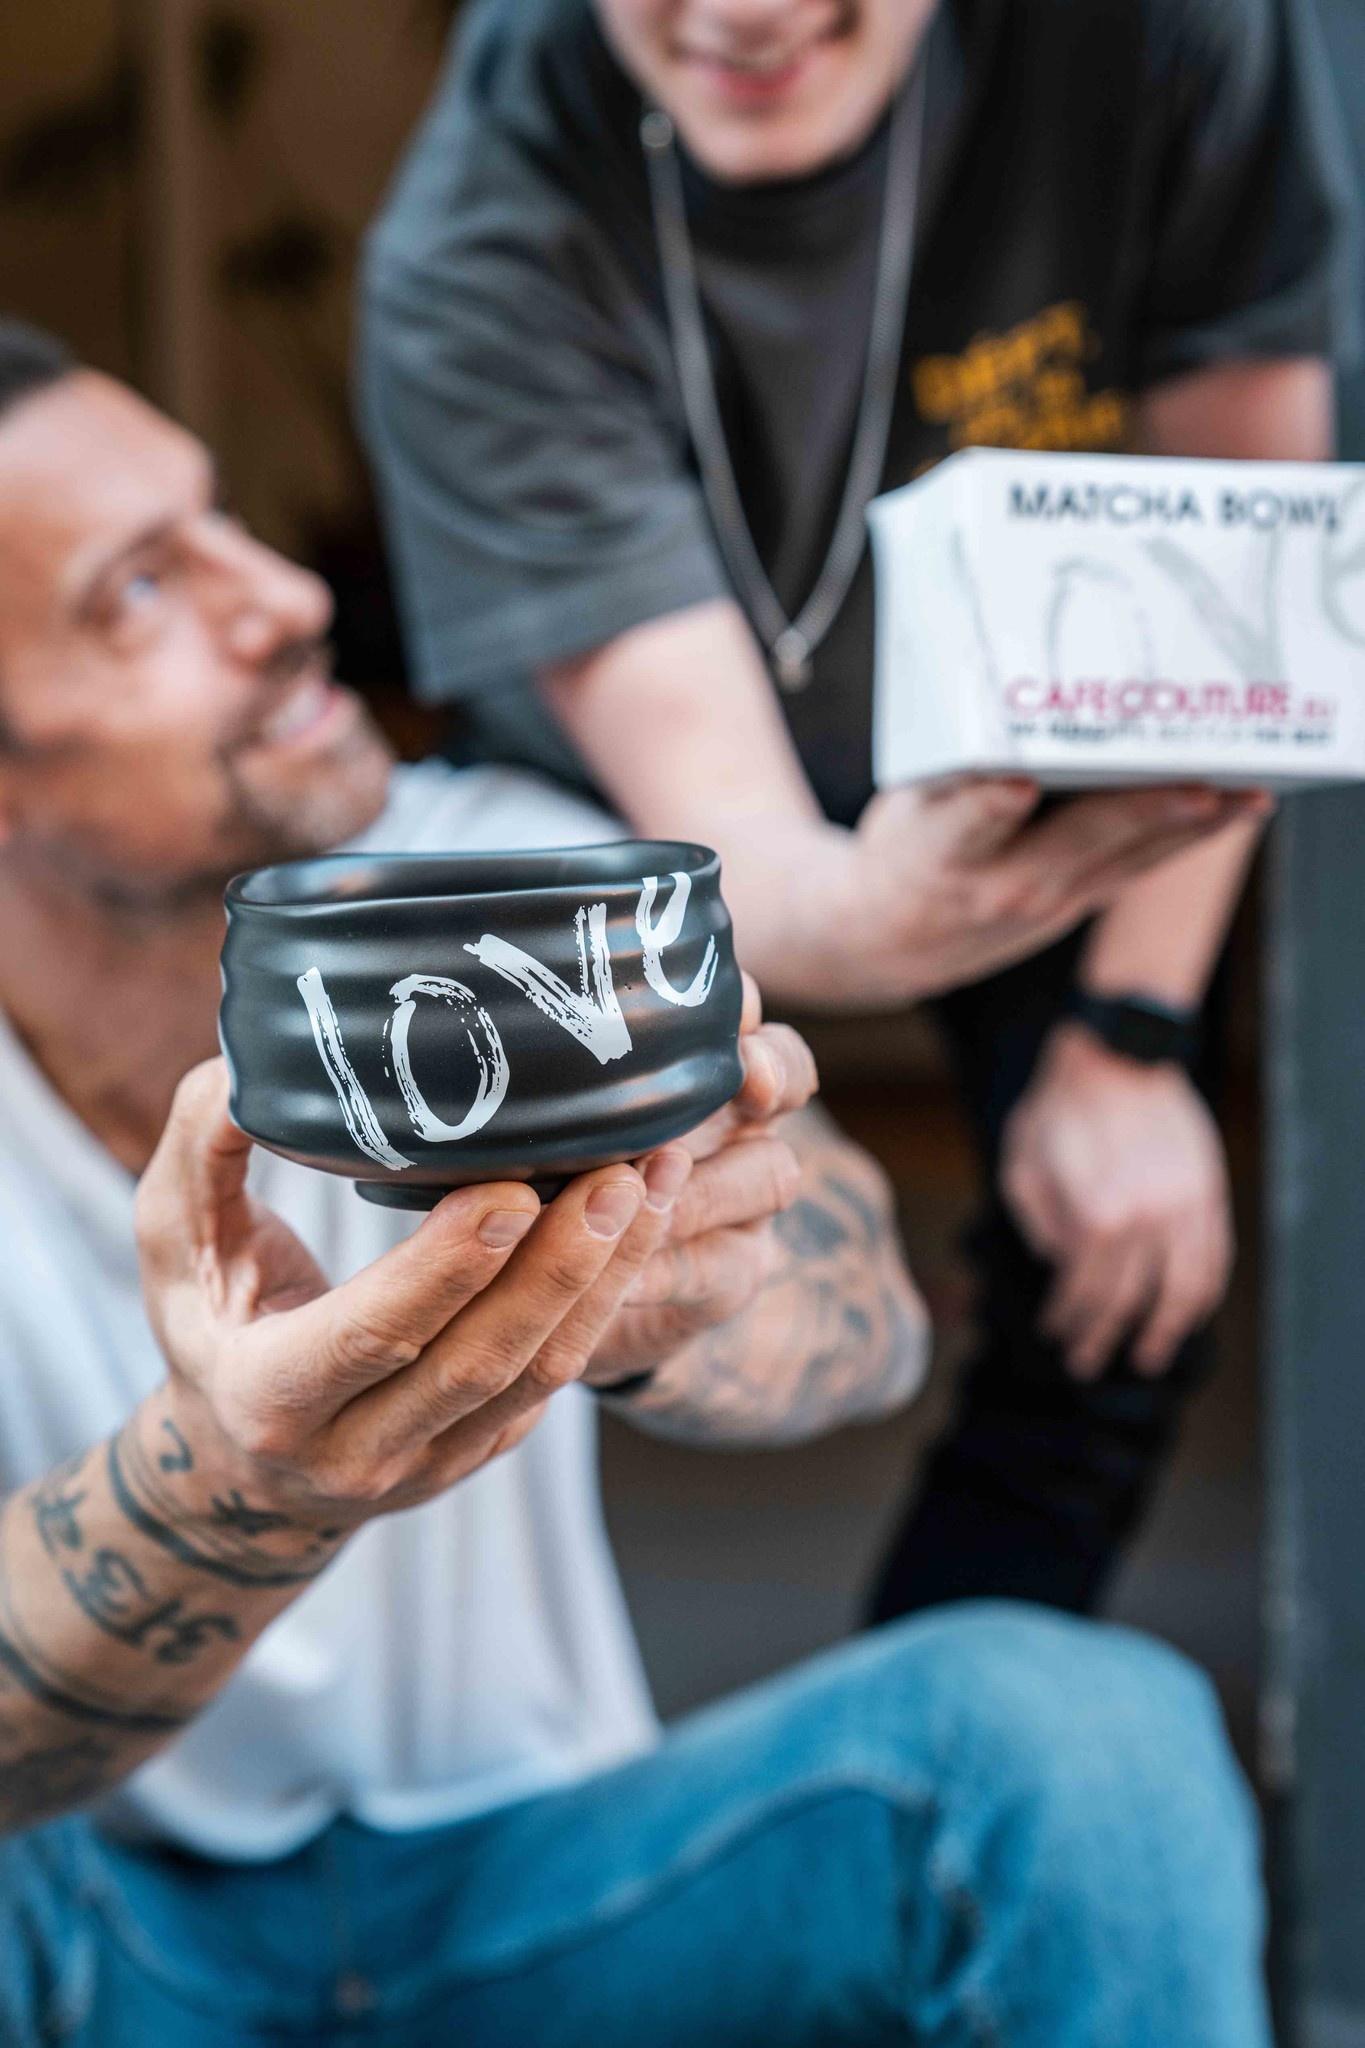 Matcha bowl - LOVE